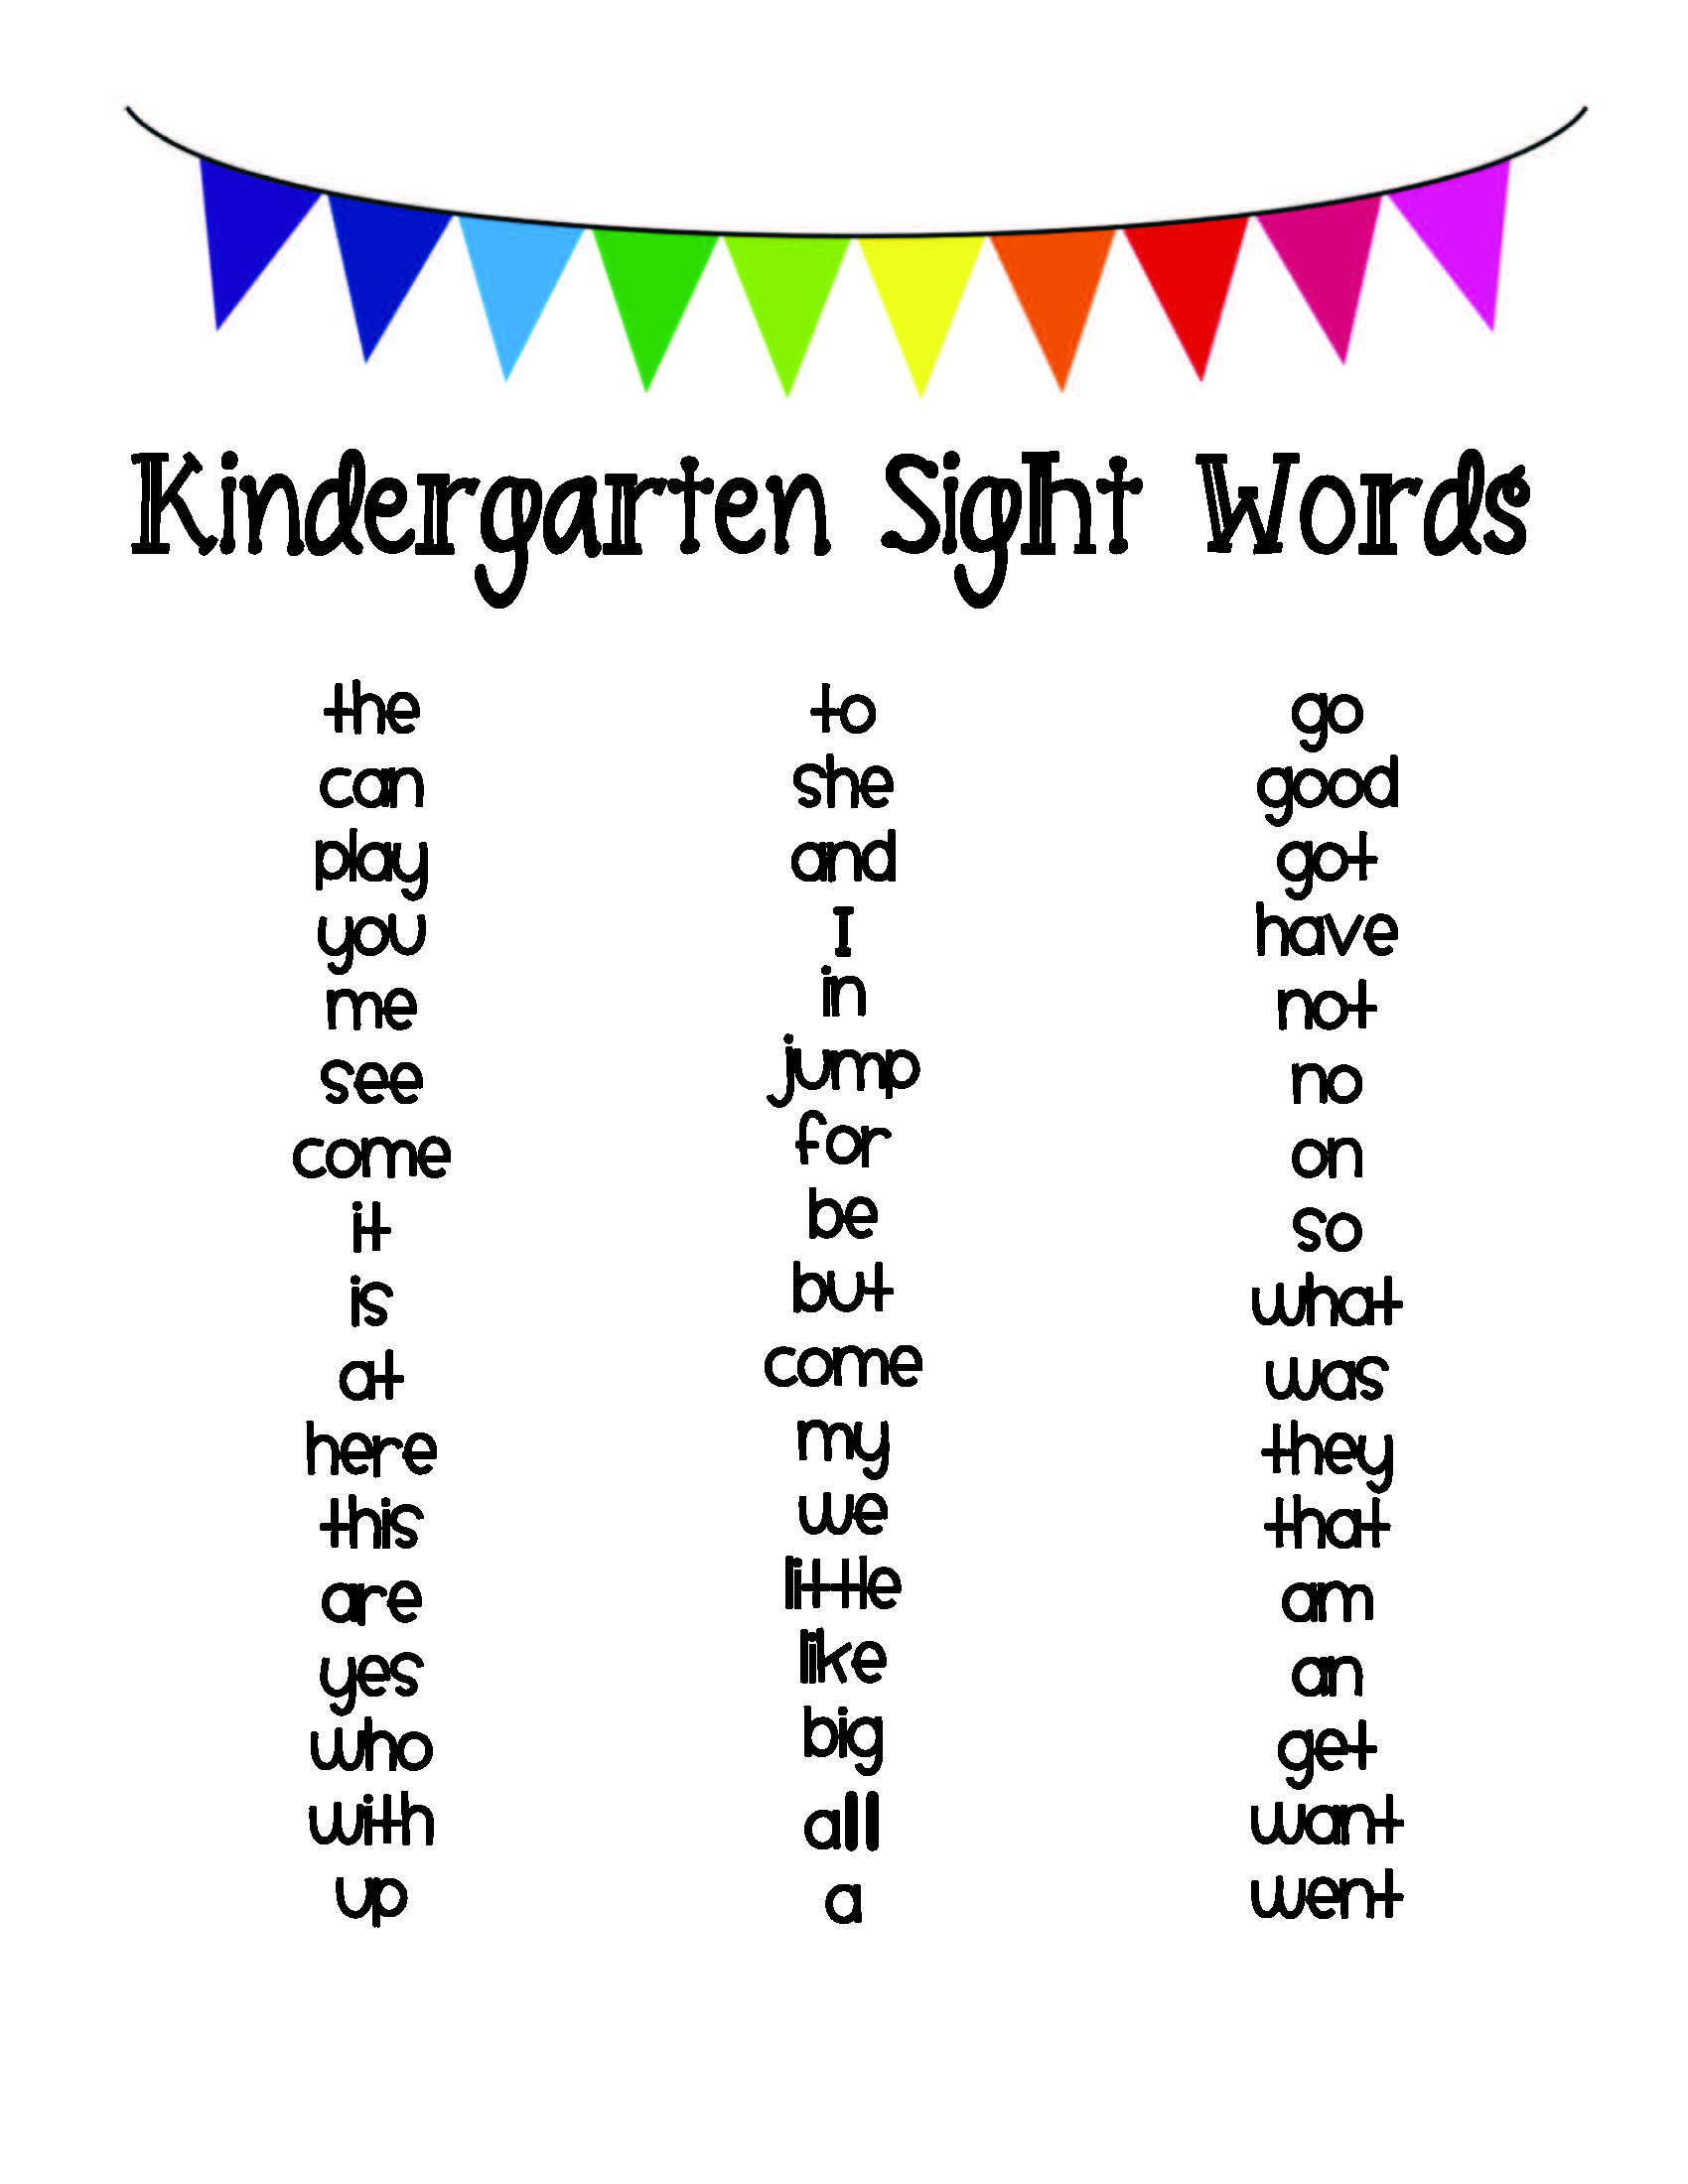 4d2a436d4f7cc060b0dd19e518113848 - Kindergarten Sight Word Printable